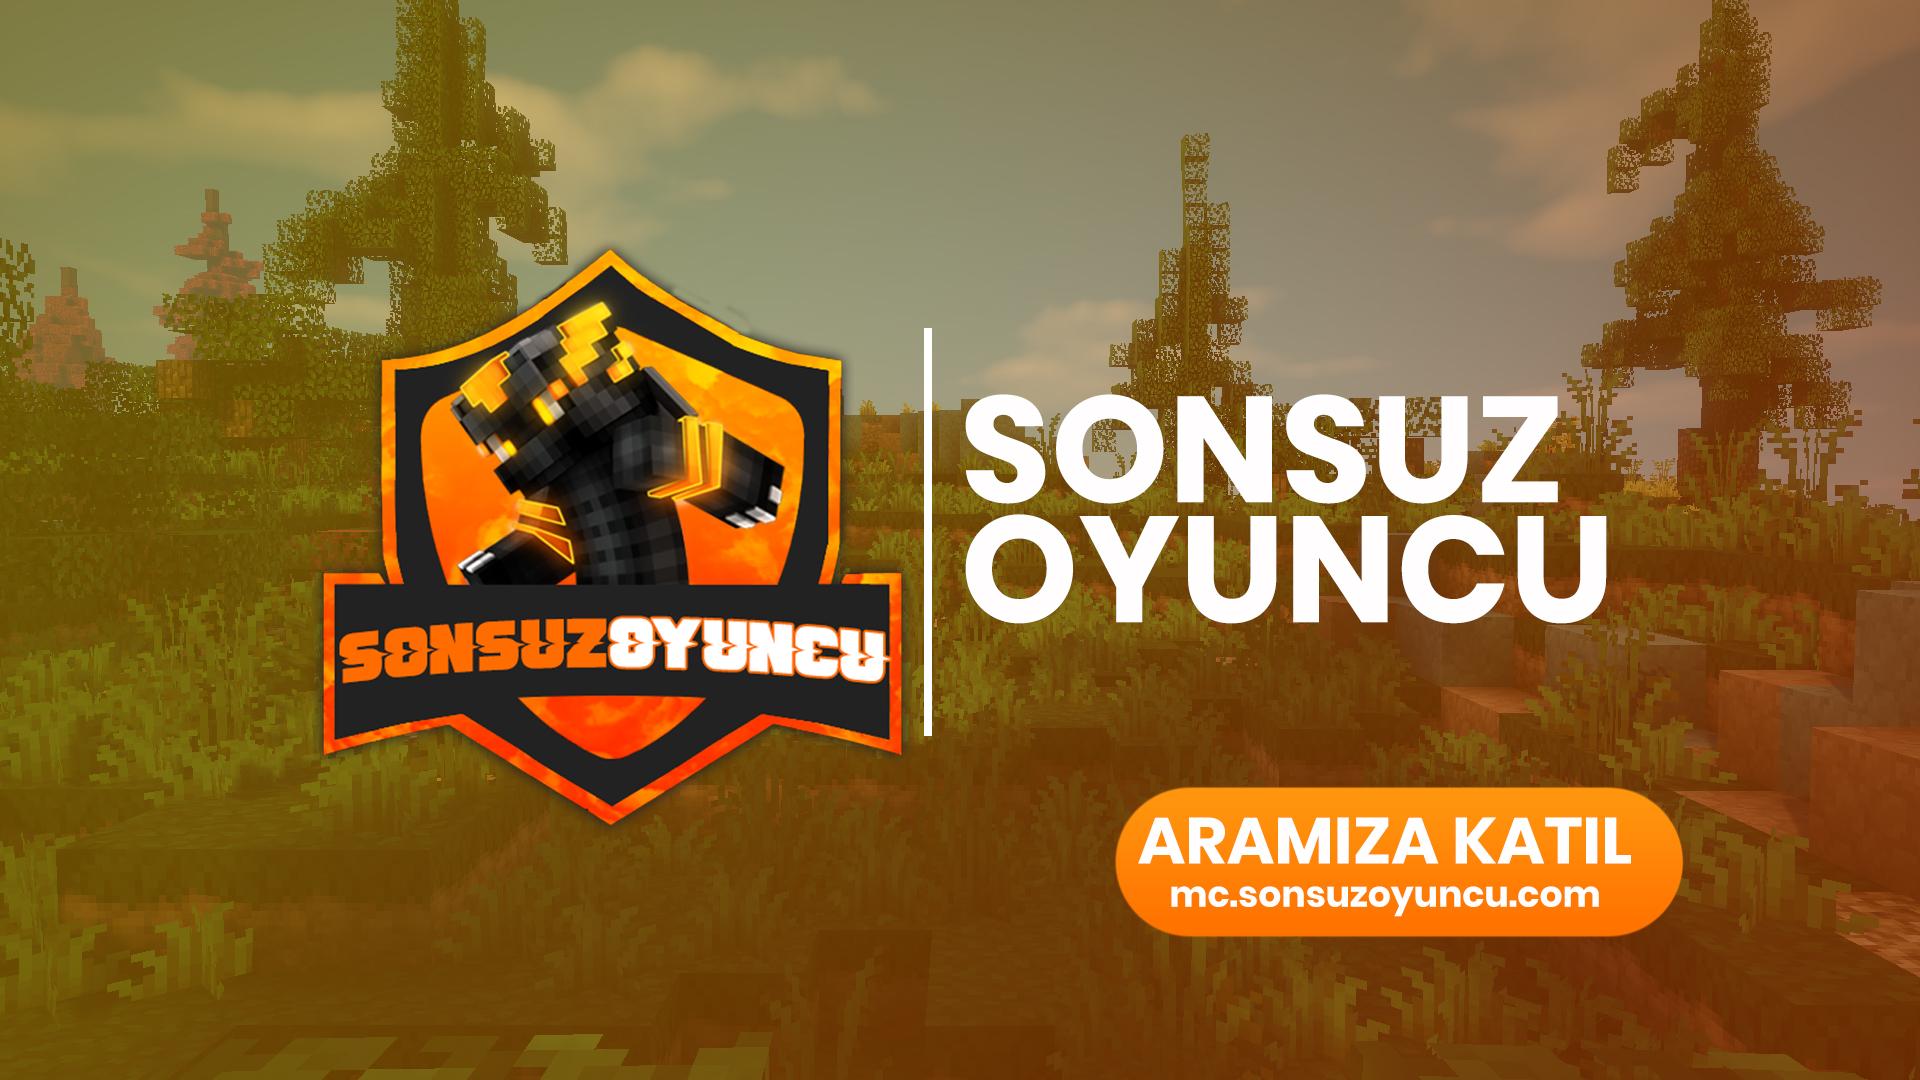 MC.SONSUZOYUNCU.COM 11 Ekim 2020 16:00'da AKTİF!